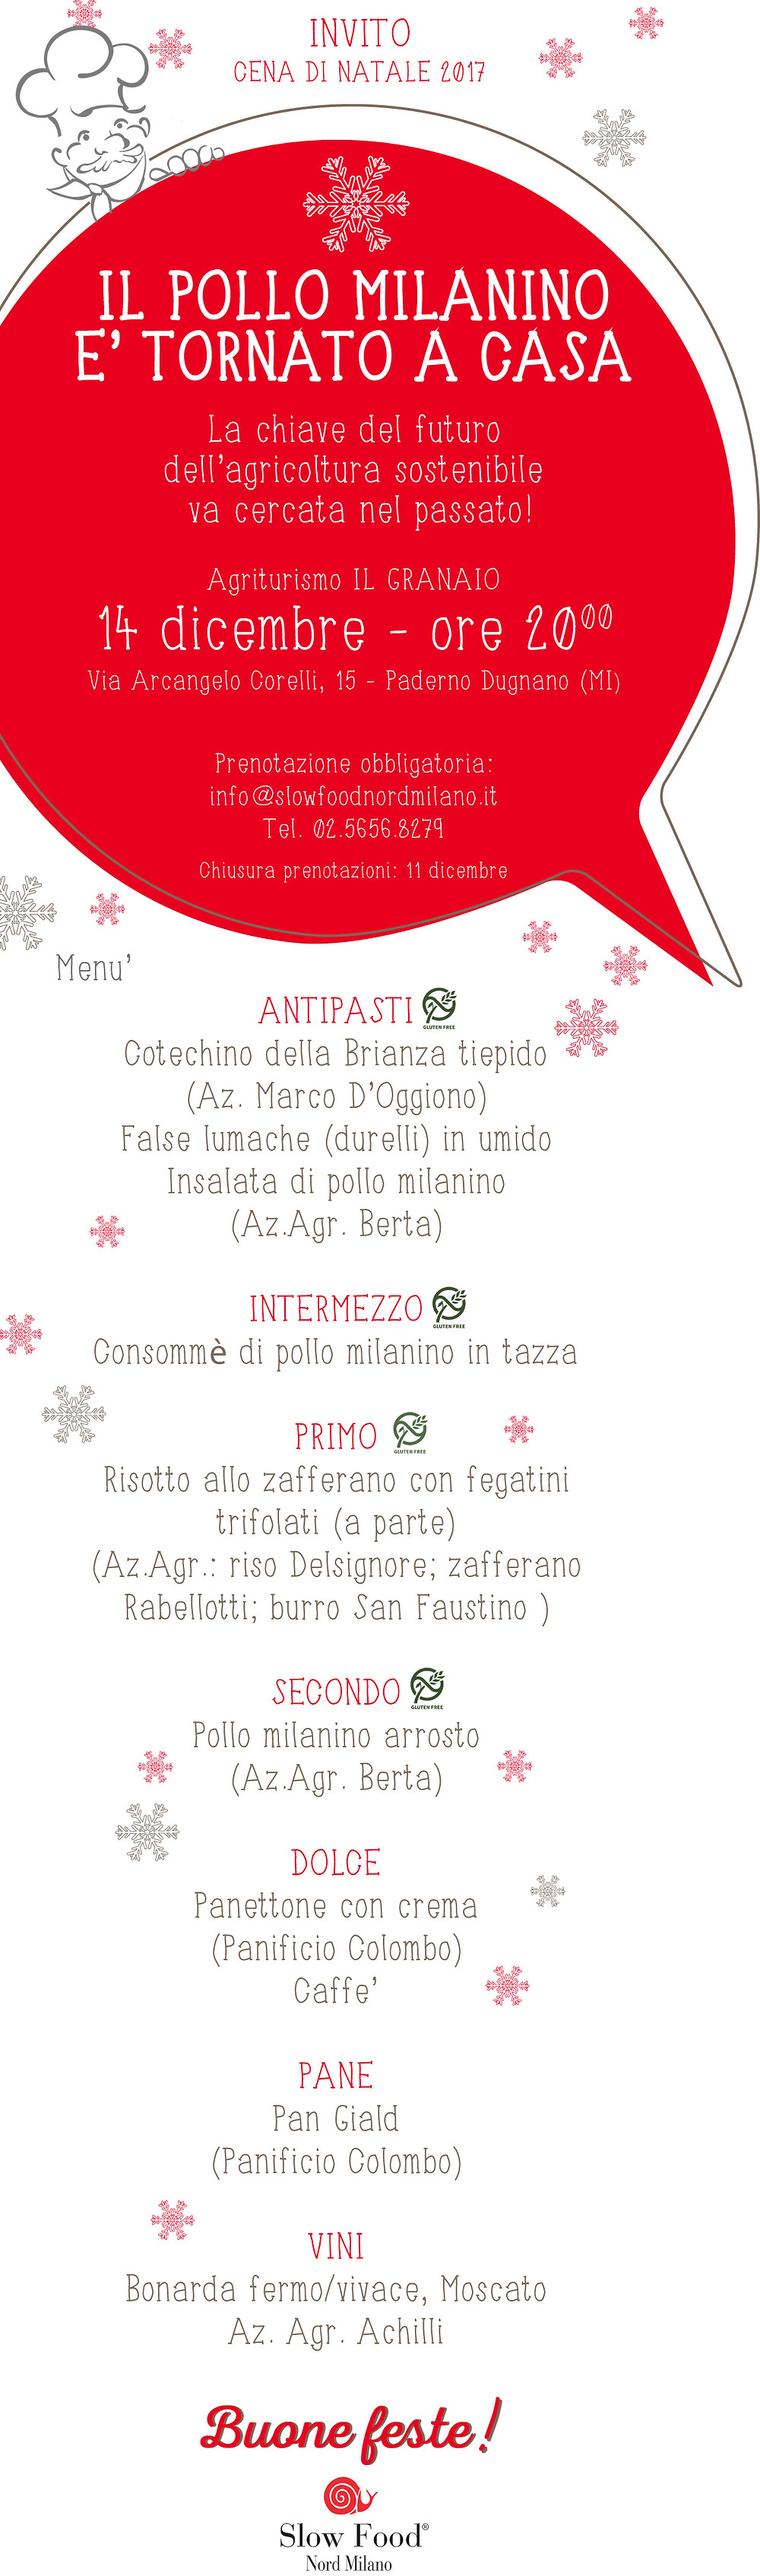 CENA NATALE 2017 SLOW FOOD NORD MILANO AGRITURISMO IL GRANAIO